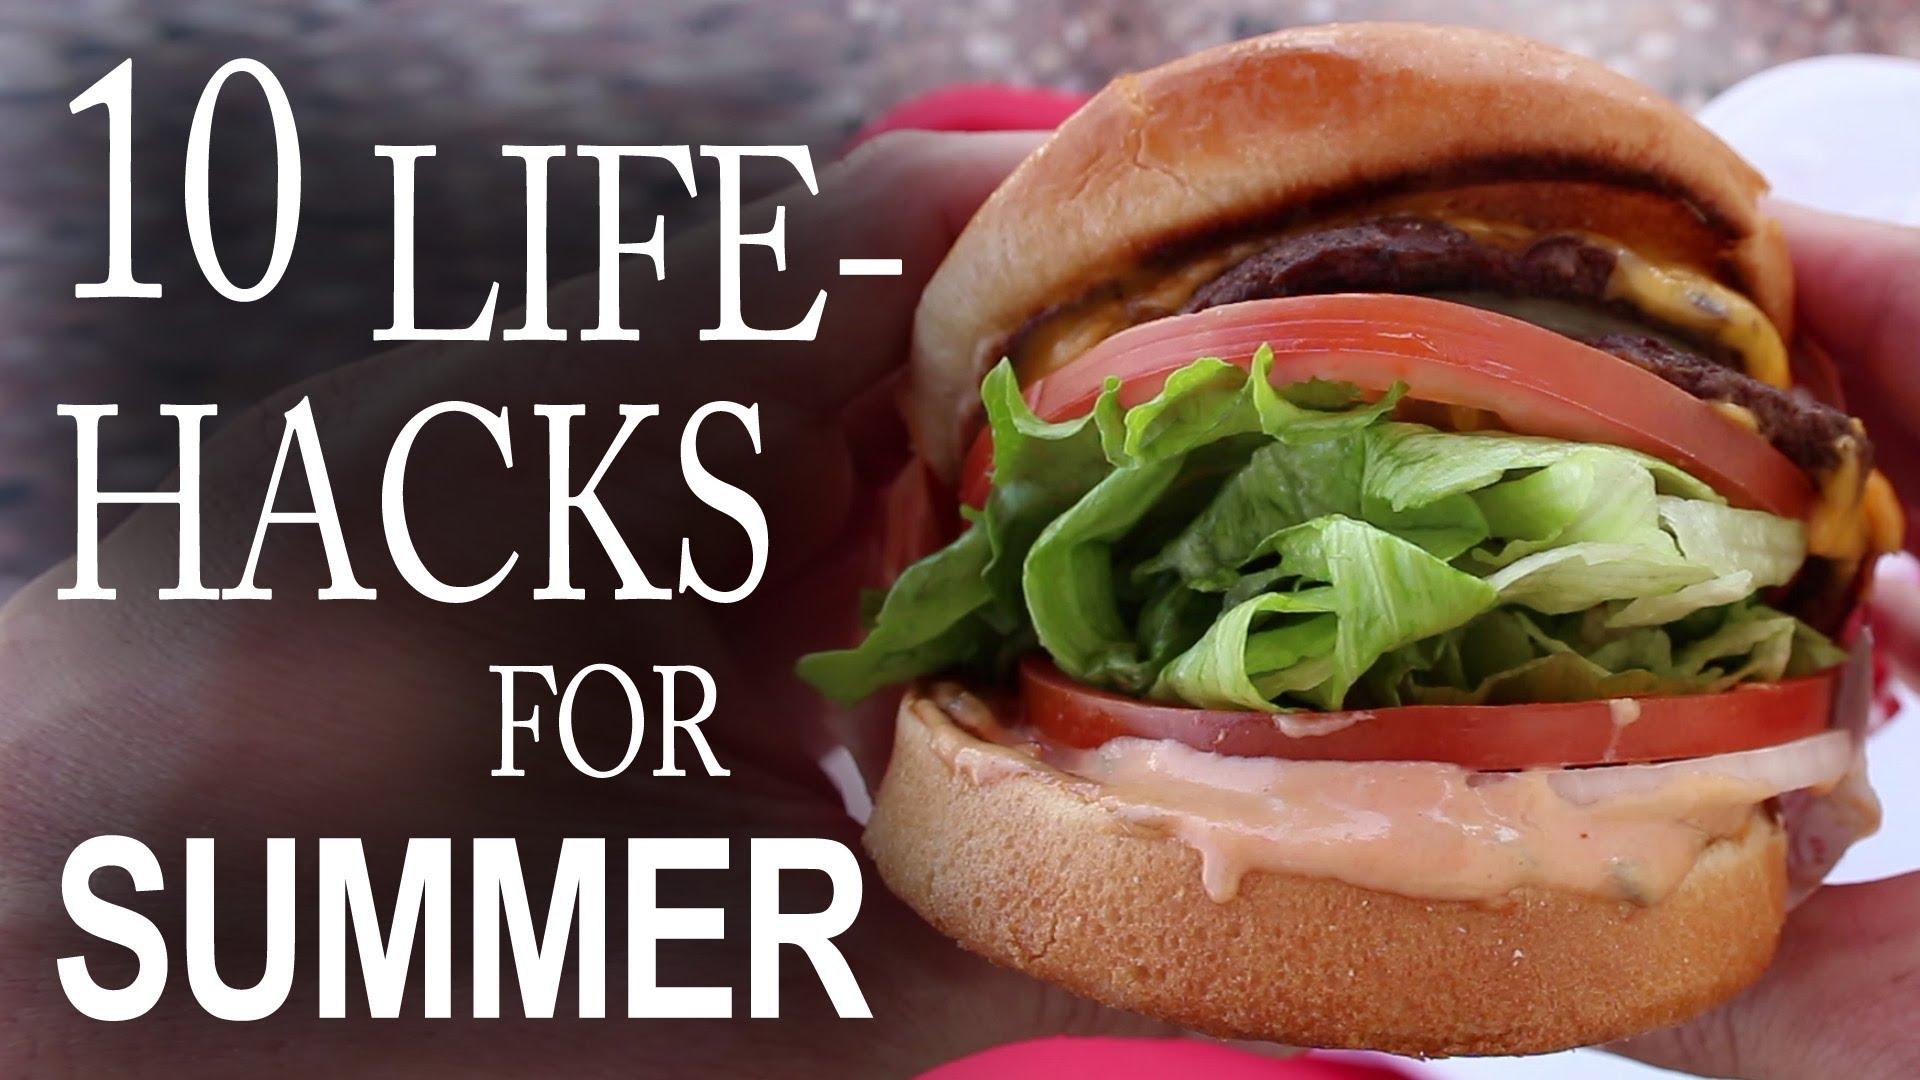 「夏日大作戰!十個實用生活小技巧」- Ten Life Hacks You Need To Know For Summer!